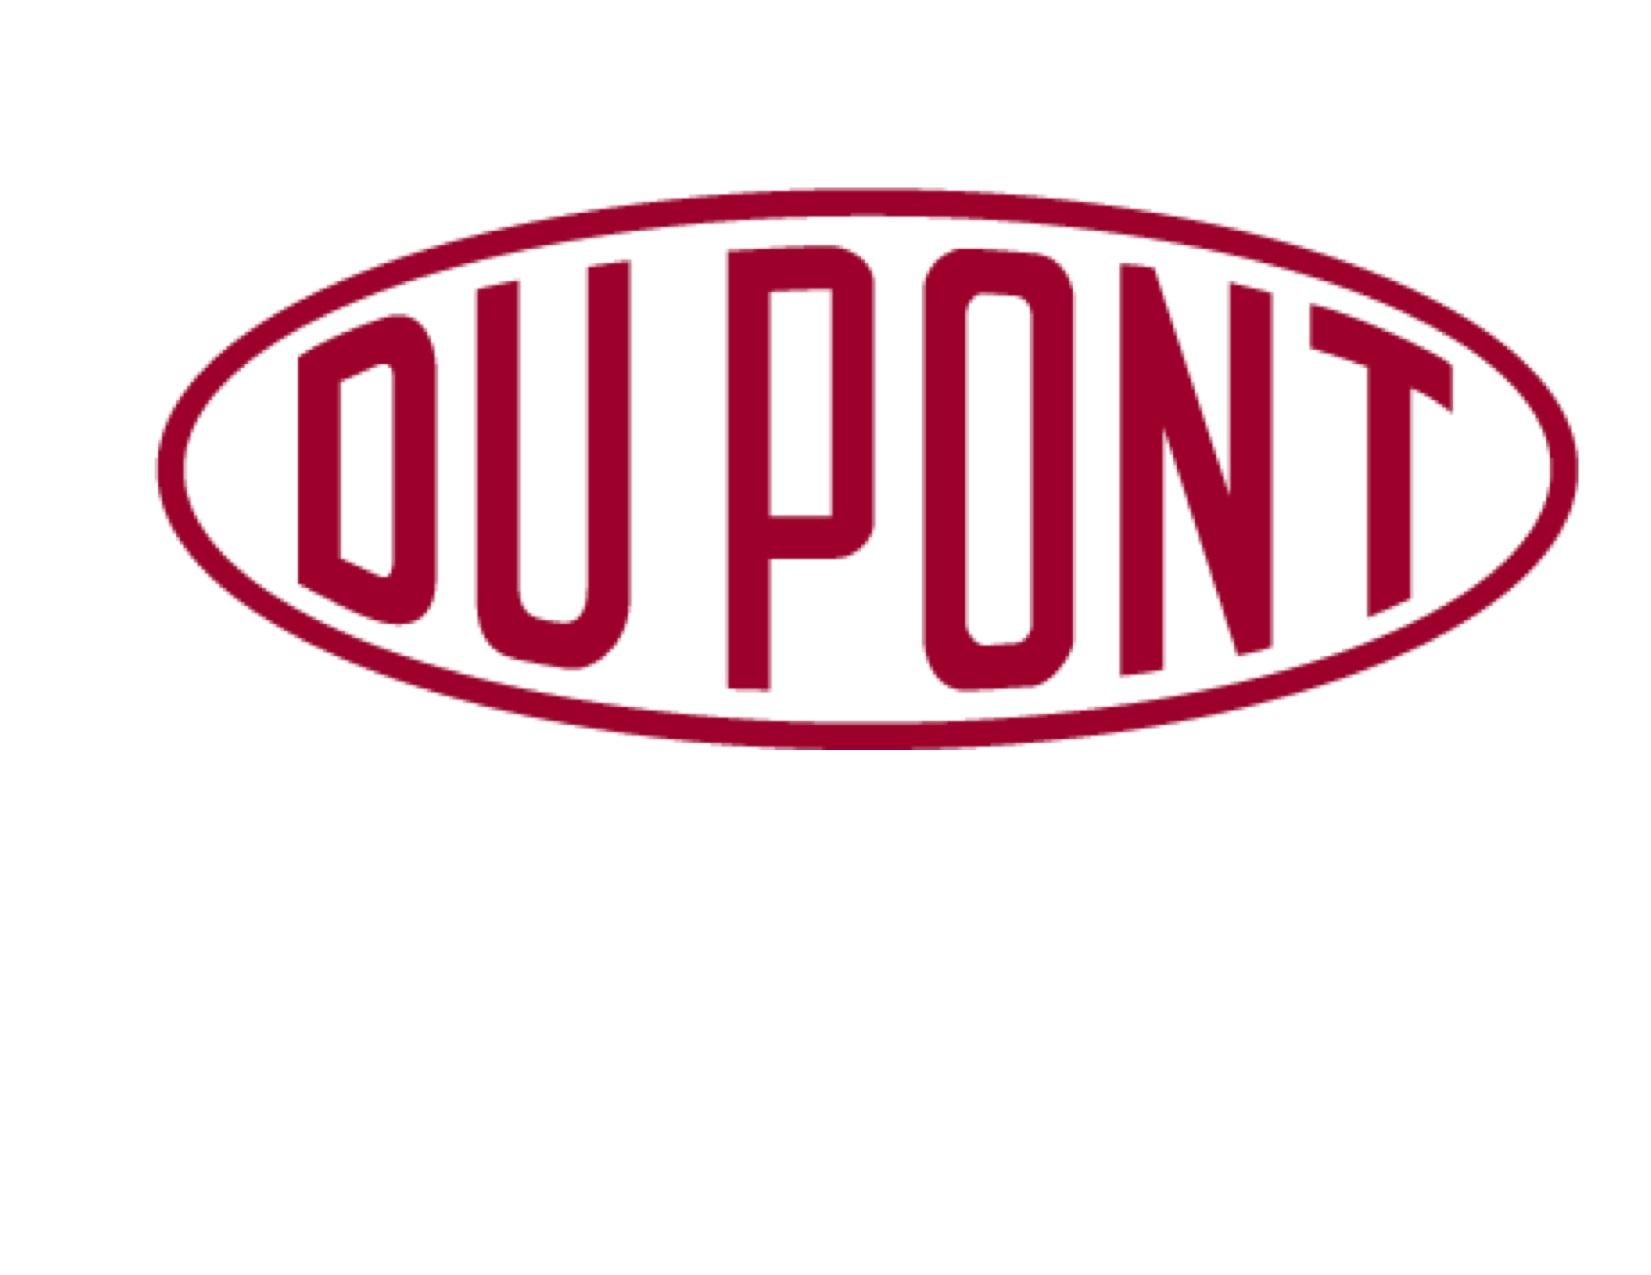 dupont_logo1.jpg